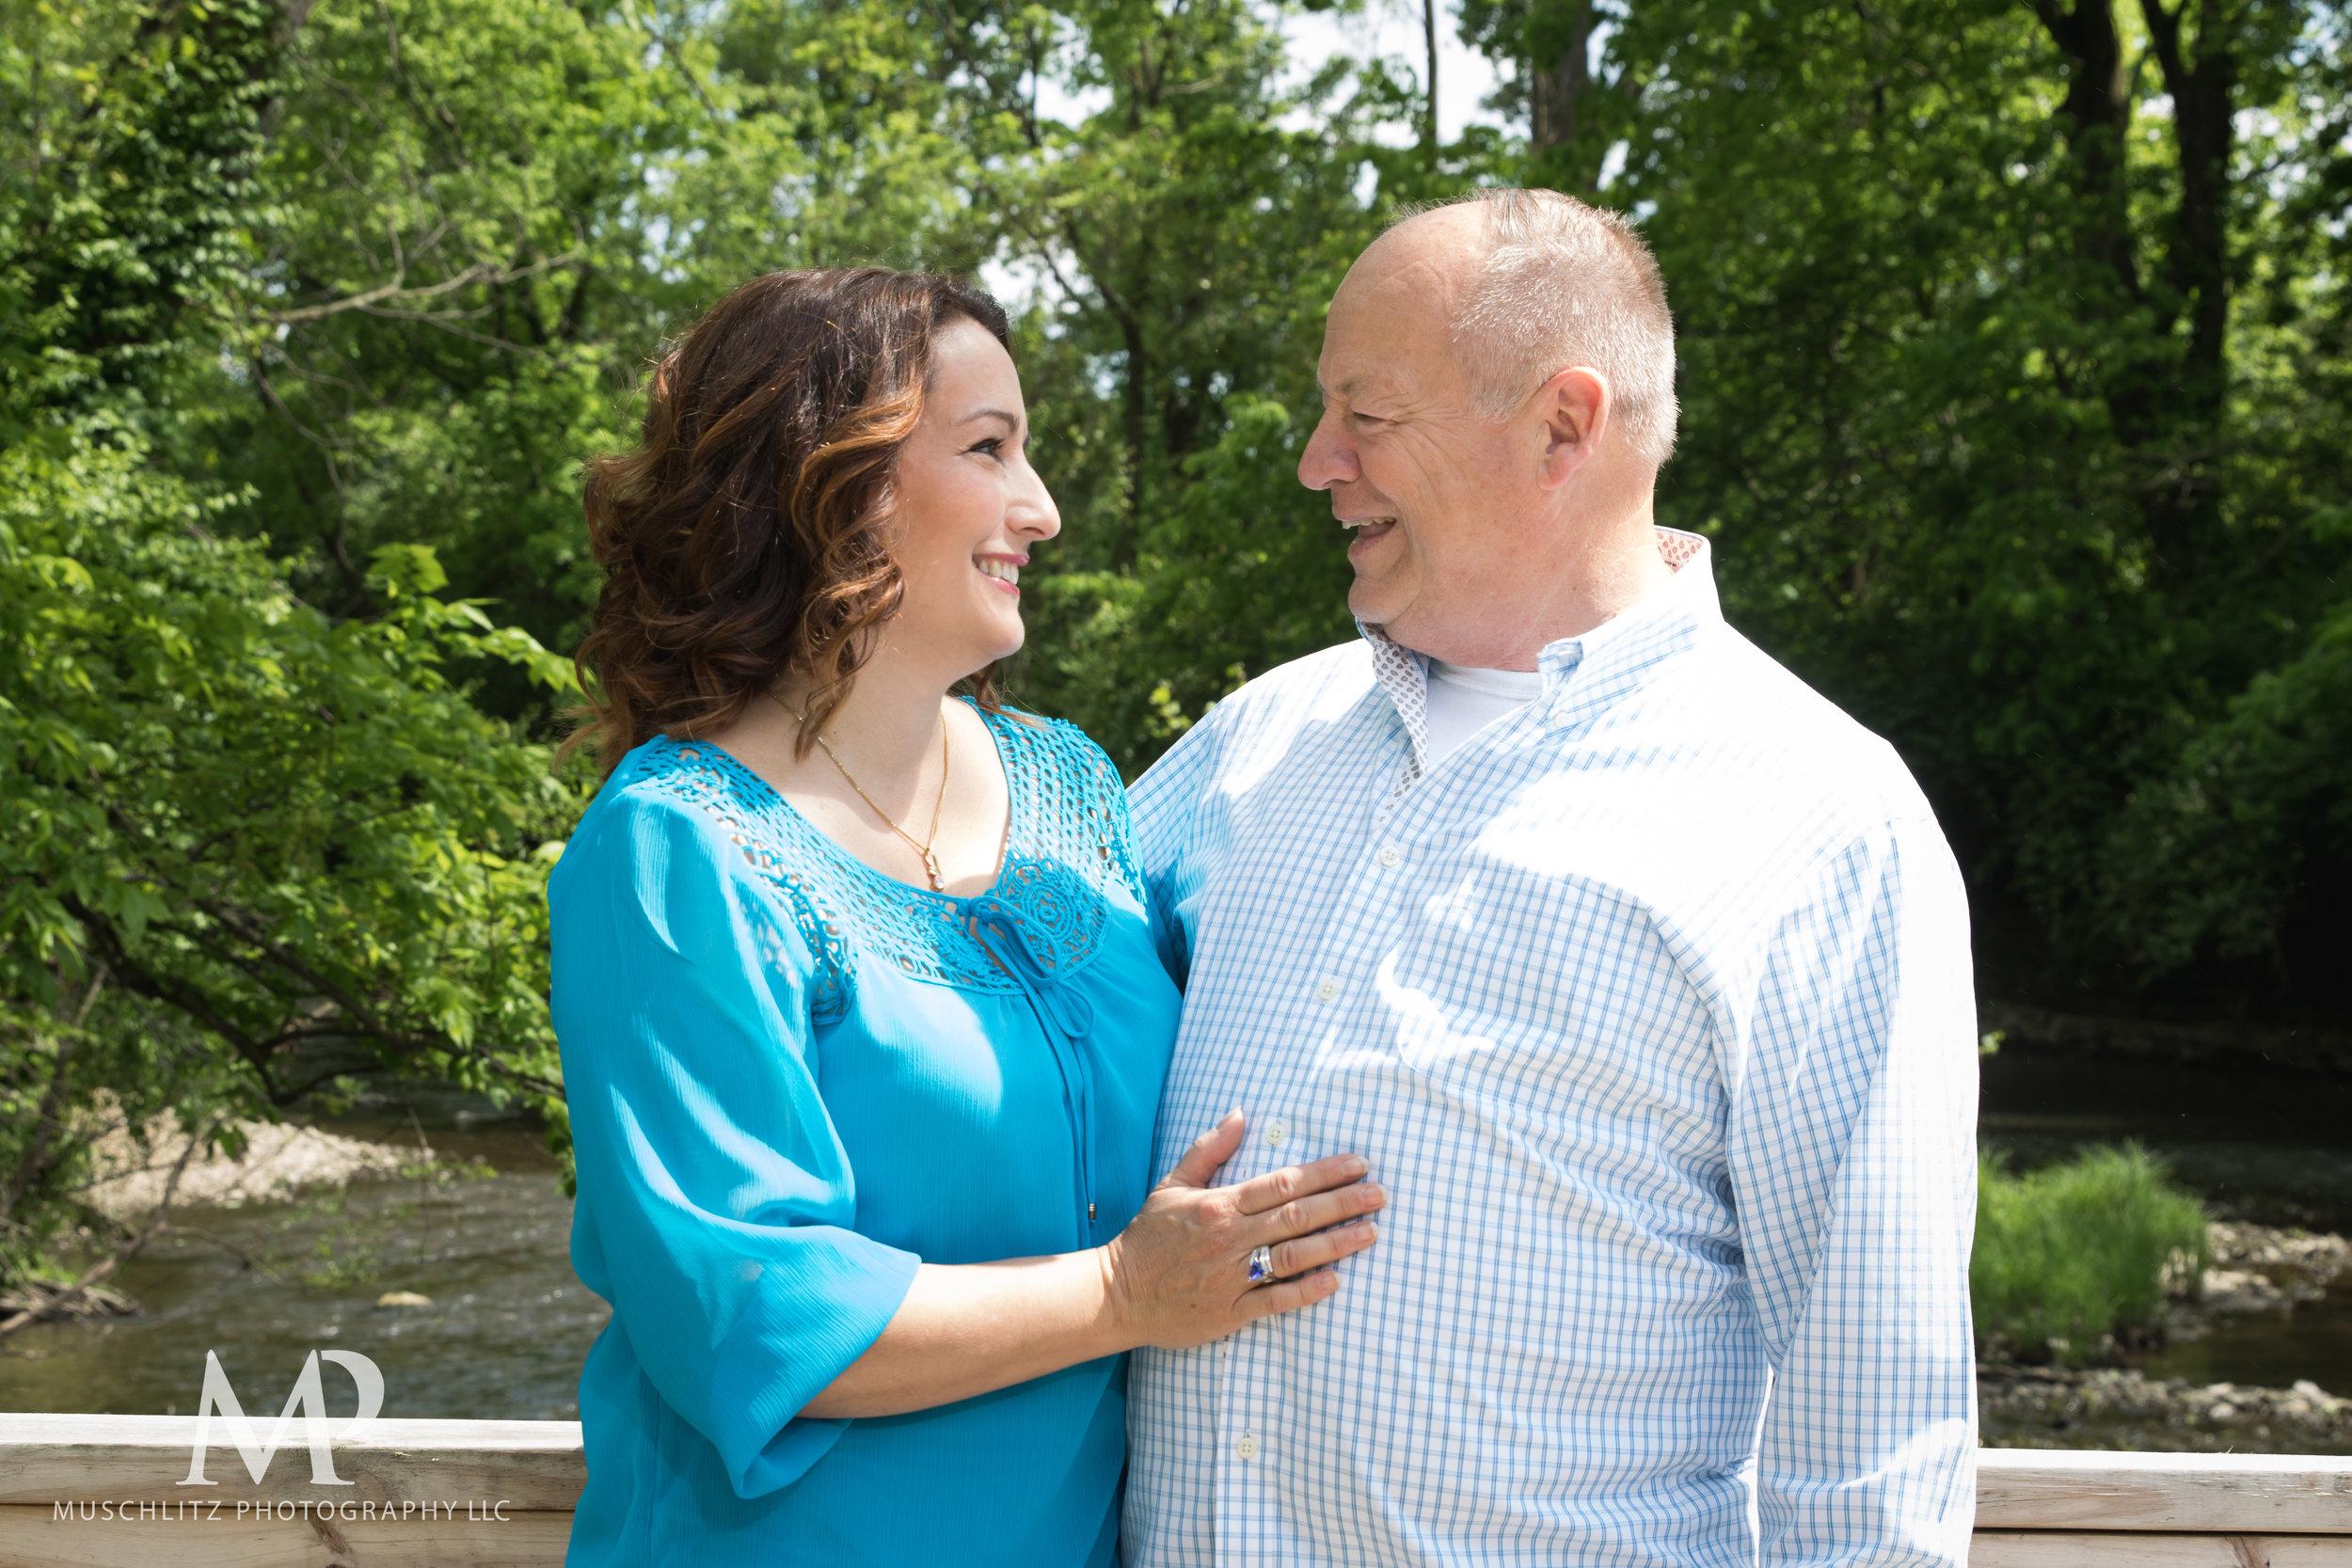 anniversary-couple-portrait-session-creekside-park-plaza-gahanna-ohio-boxer-dog-muschlitz-photography-006.JPG